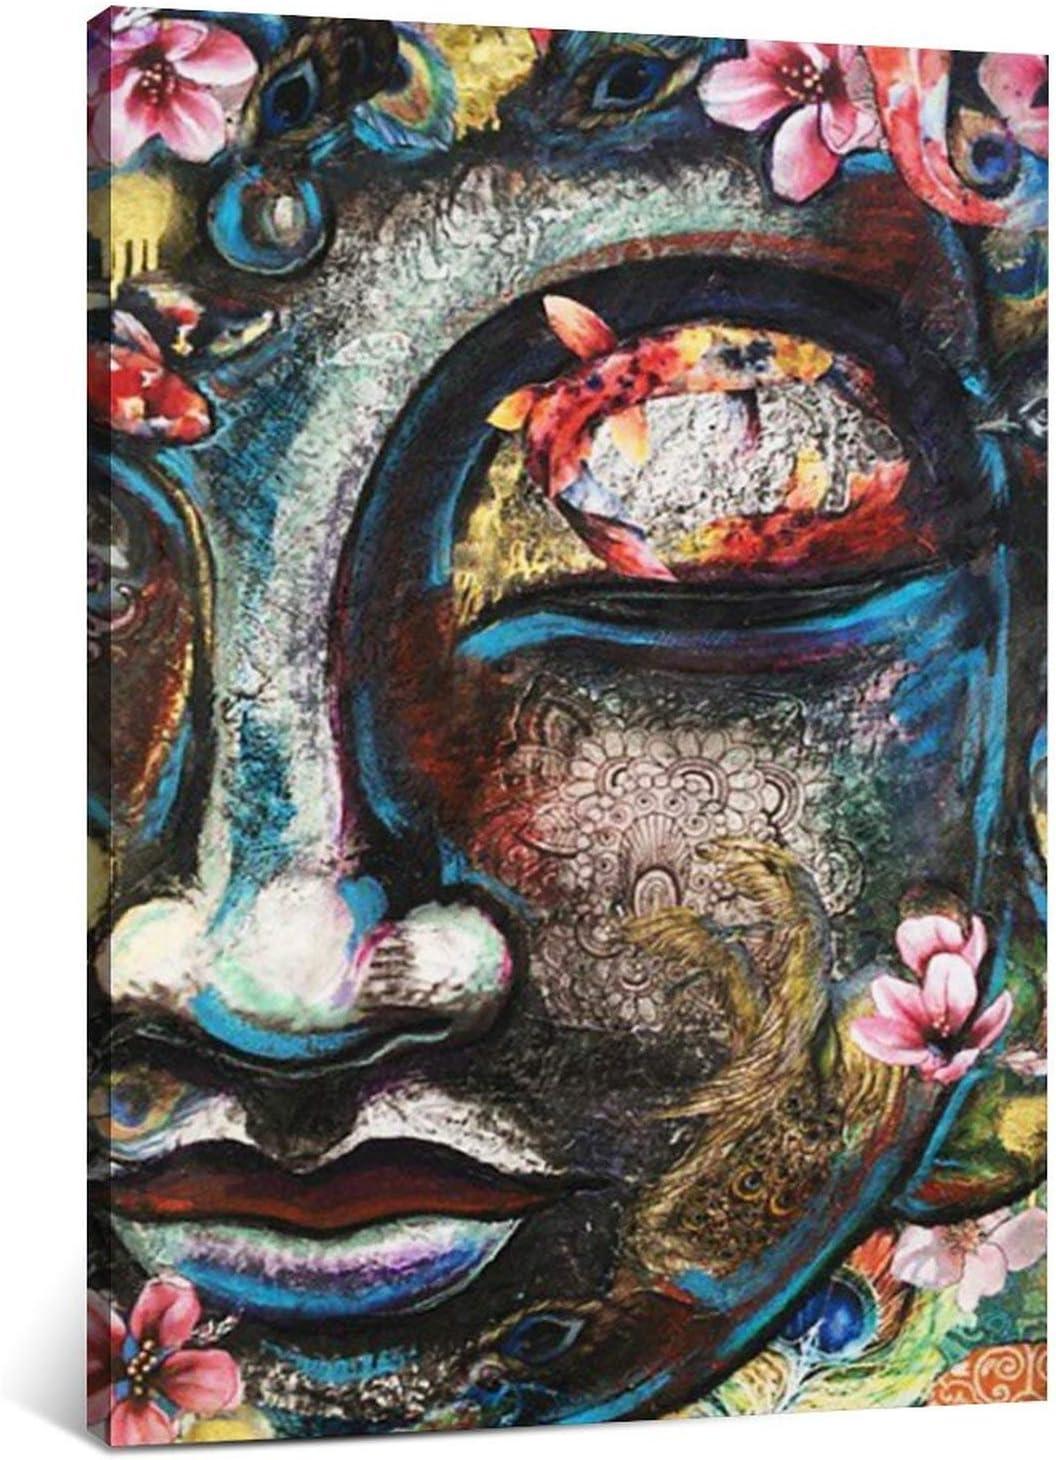 Koi Fish Peacock Feather Buddha online shop Art Canvas Custom w Ranking TOP18 Print Prints